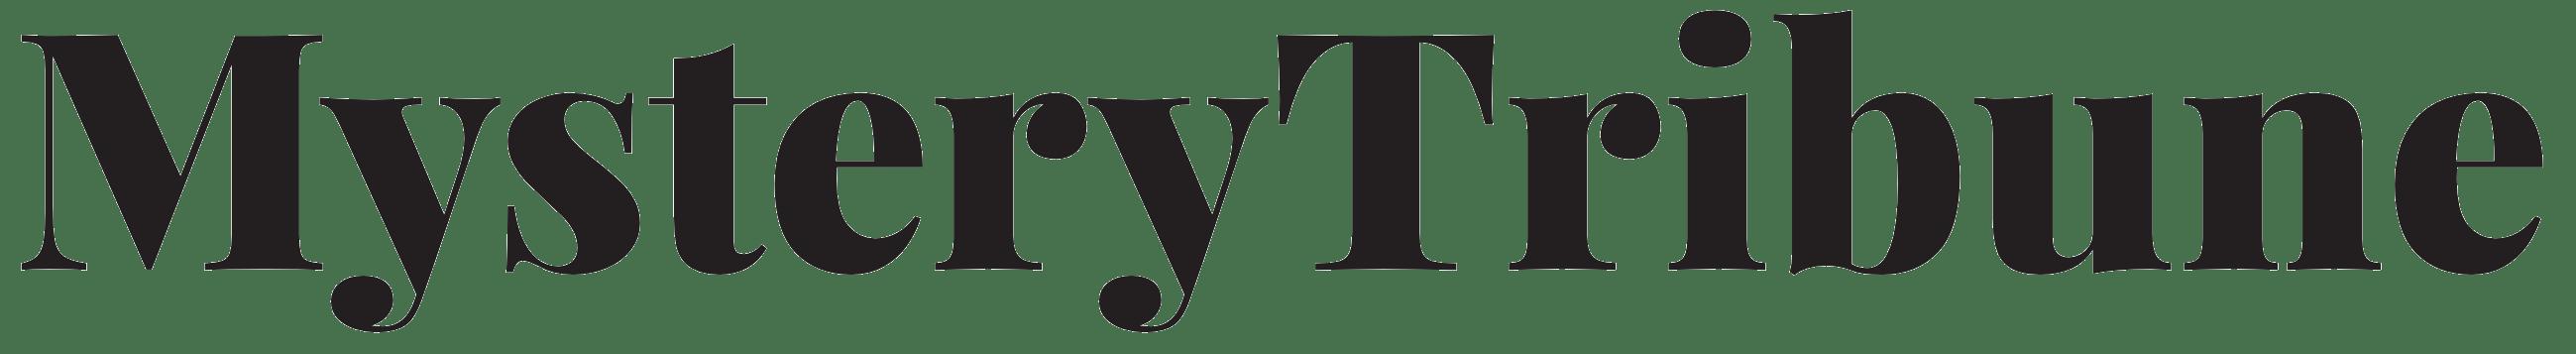 Mystery Tribune Logo